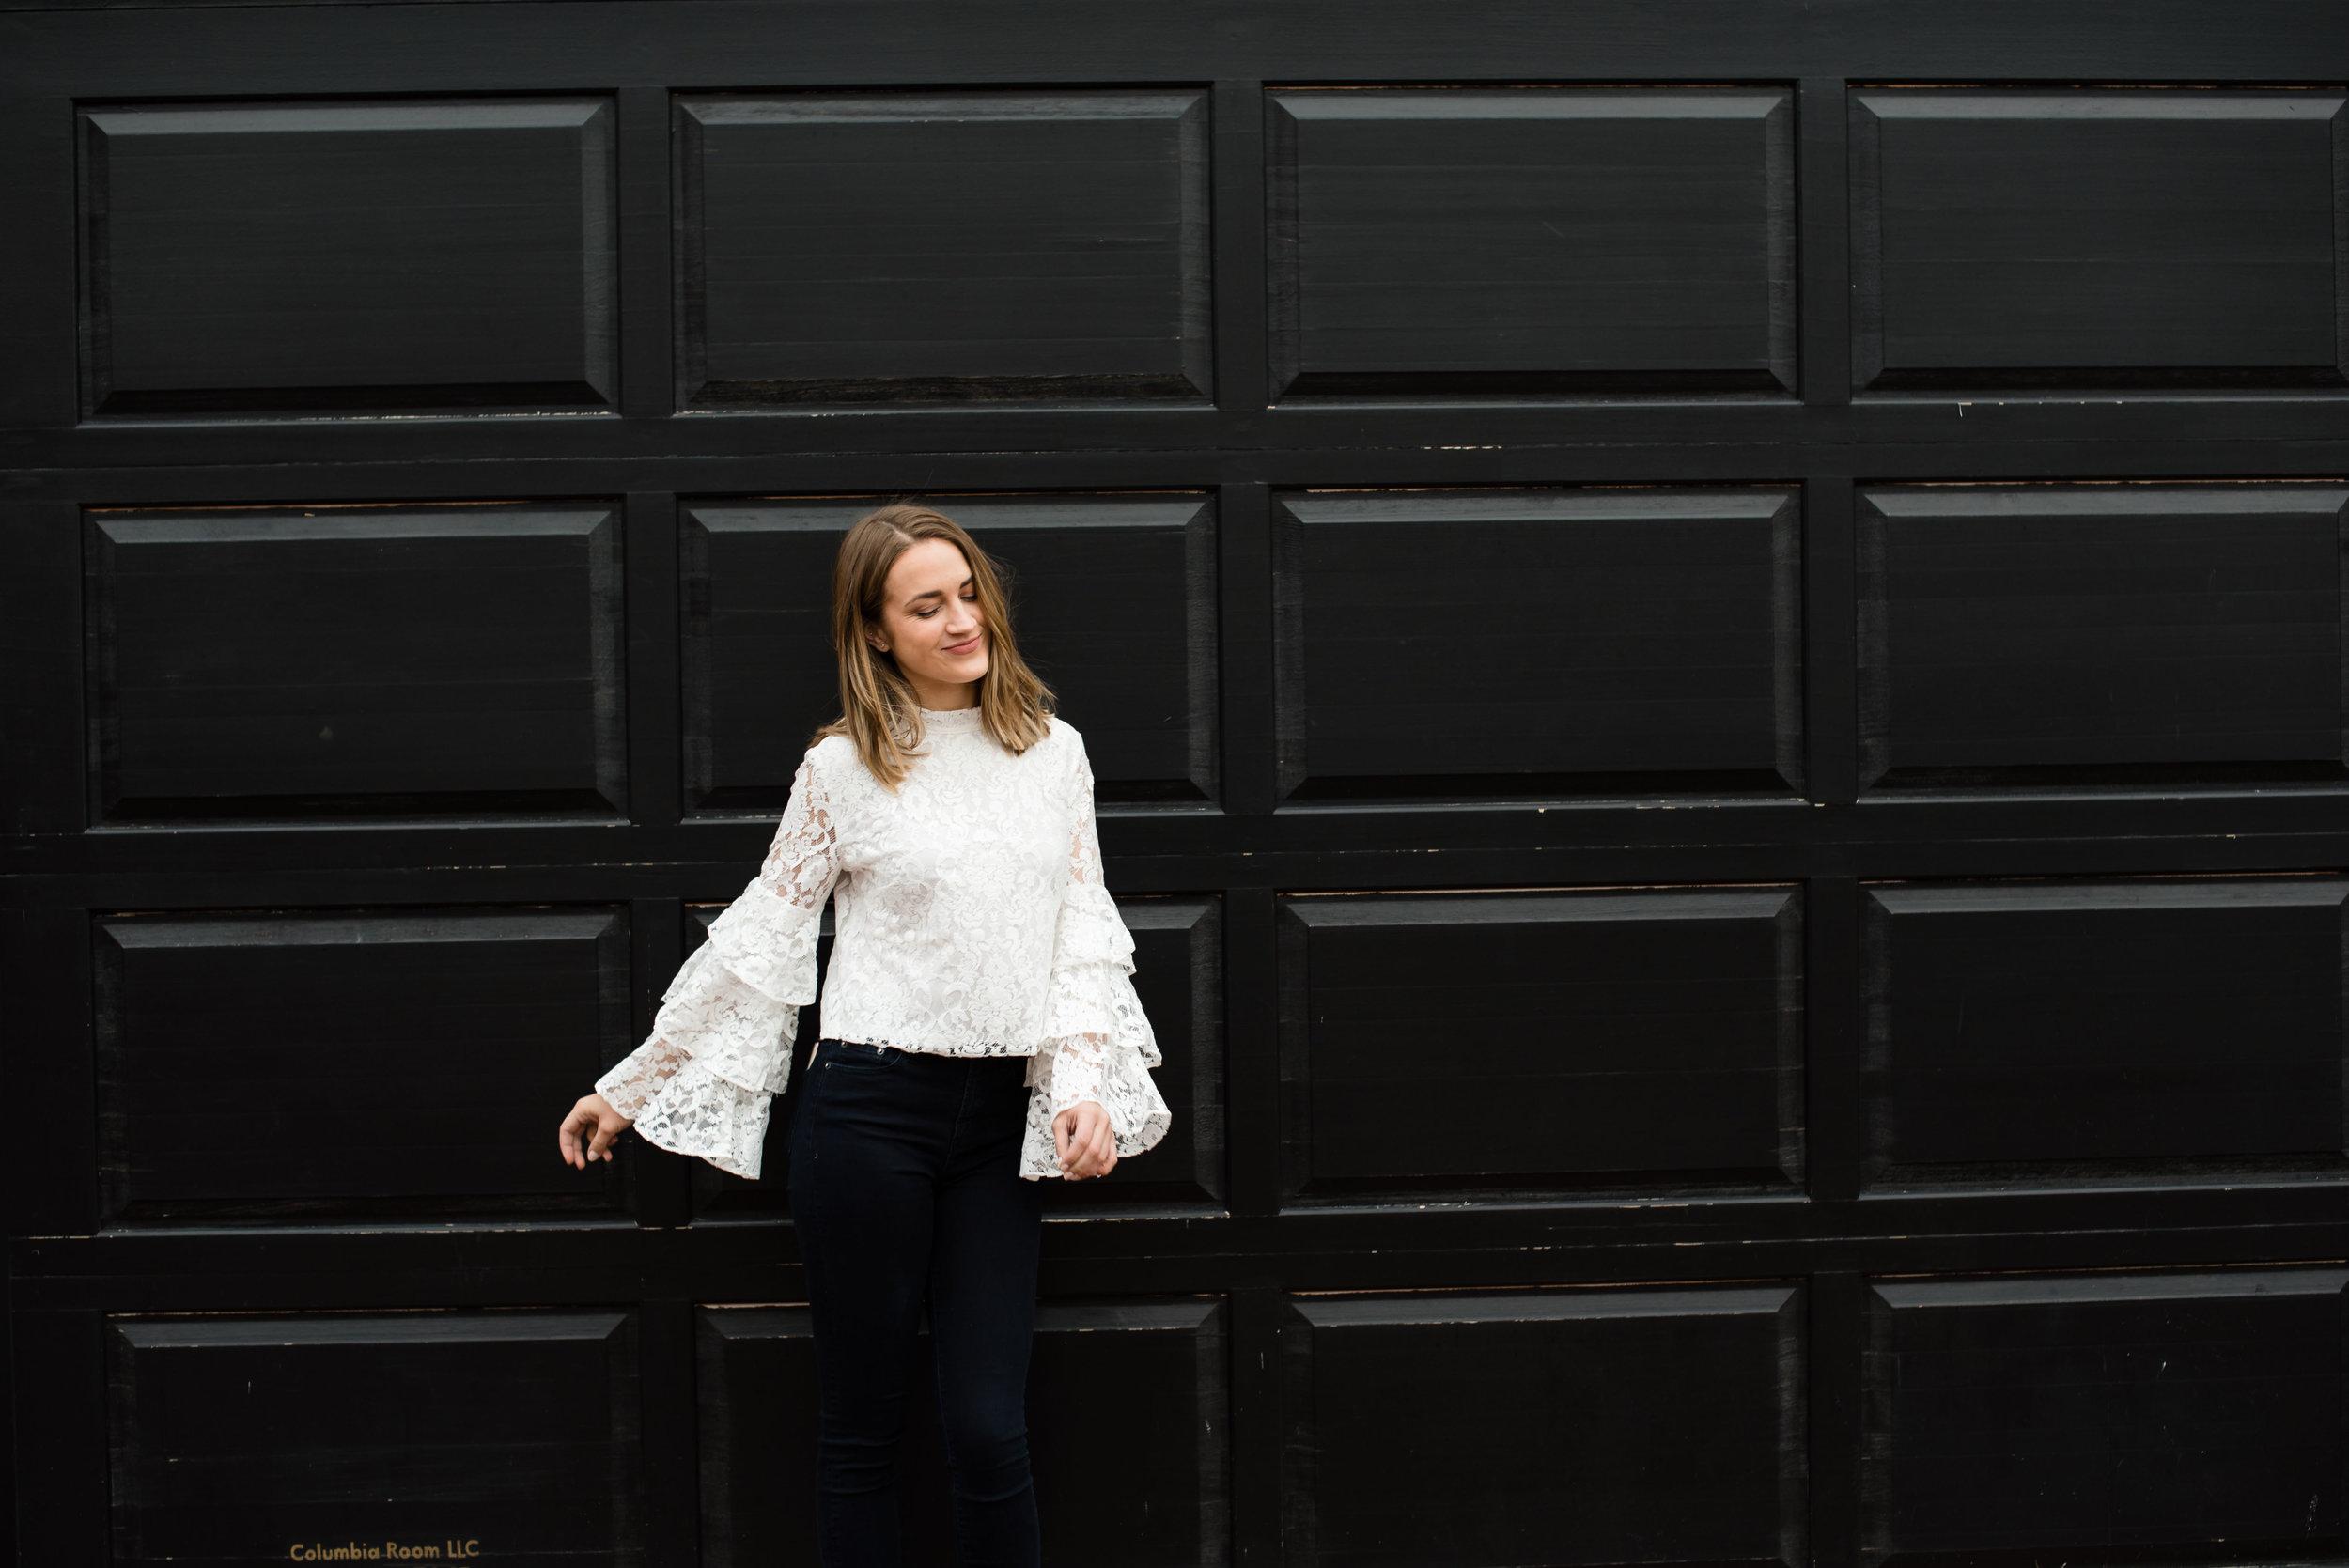 Erin-Kirkpatrick-Fabio-Photography-2018-JVL-Headshots-Jan21-81.jpg